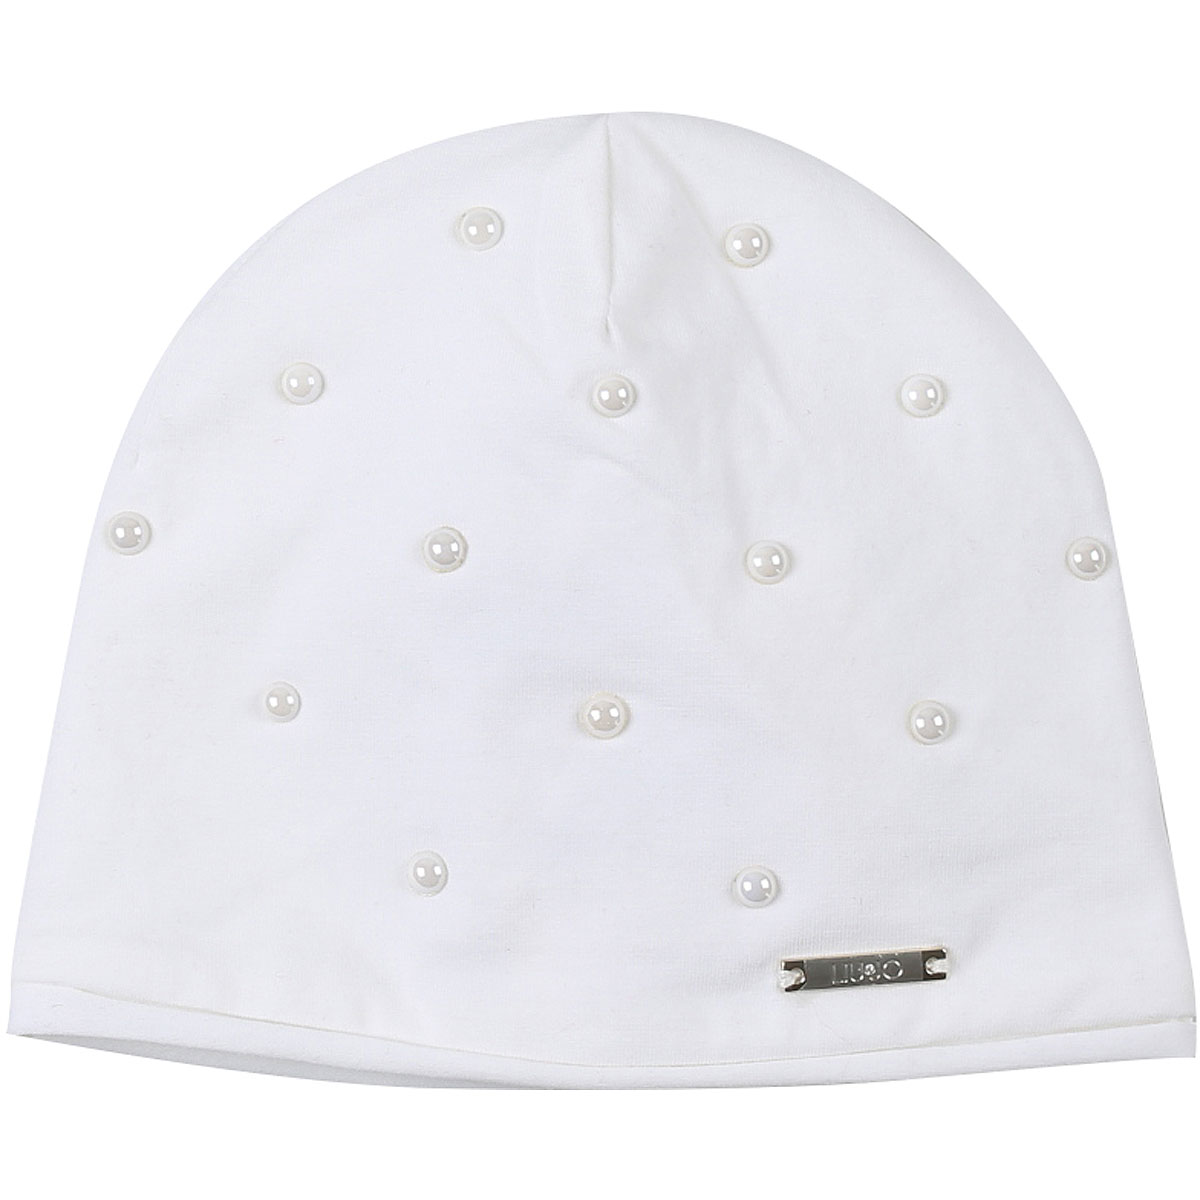 Liu Jo Baby Girl Clothing On Sale, White, Cotton, 2019, L M S